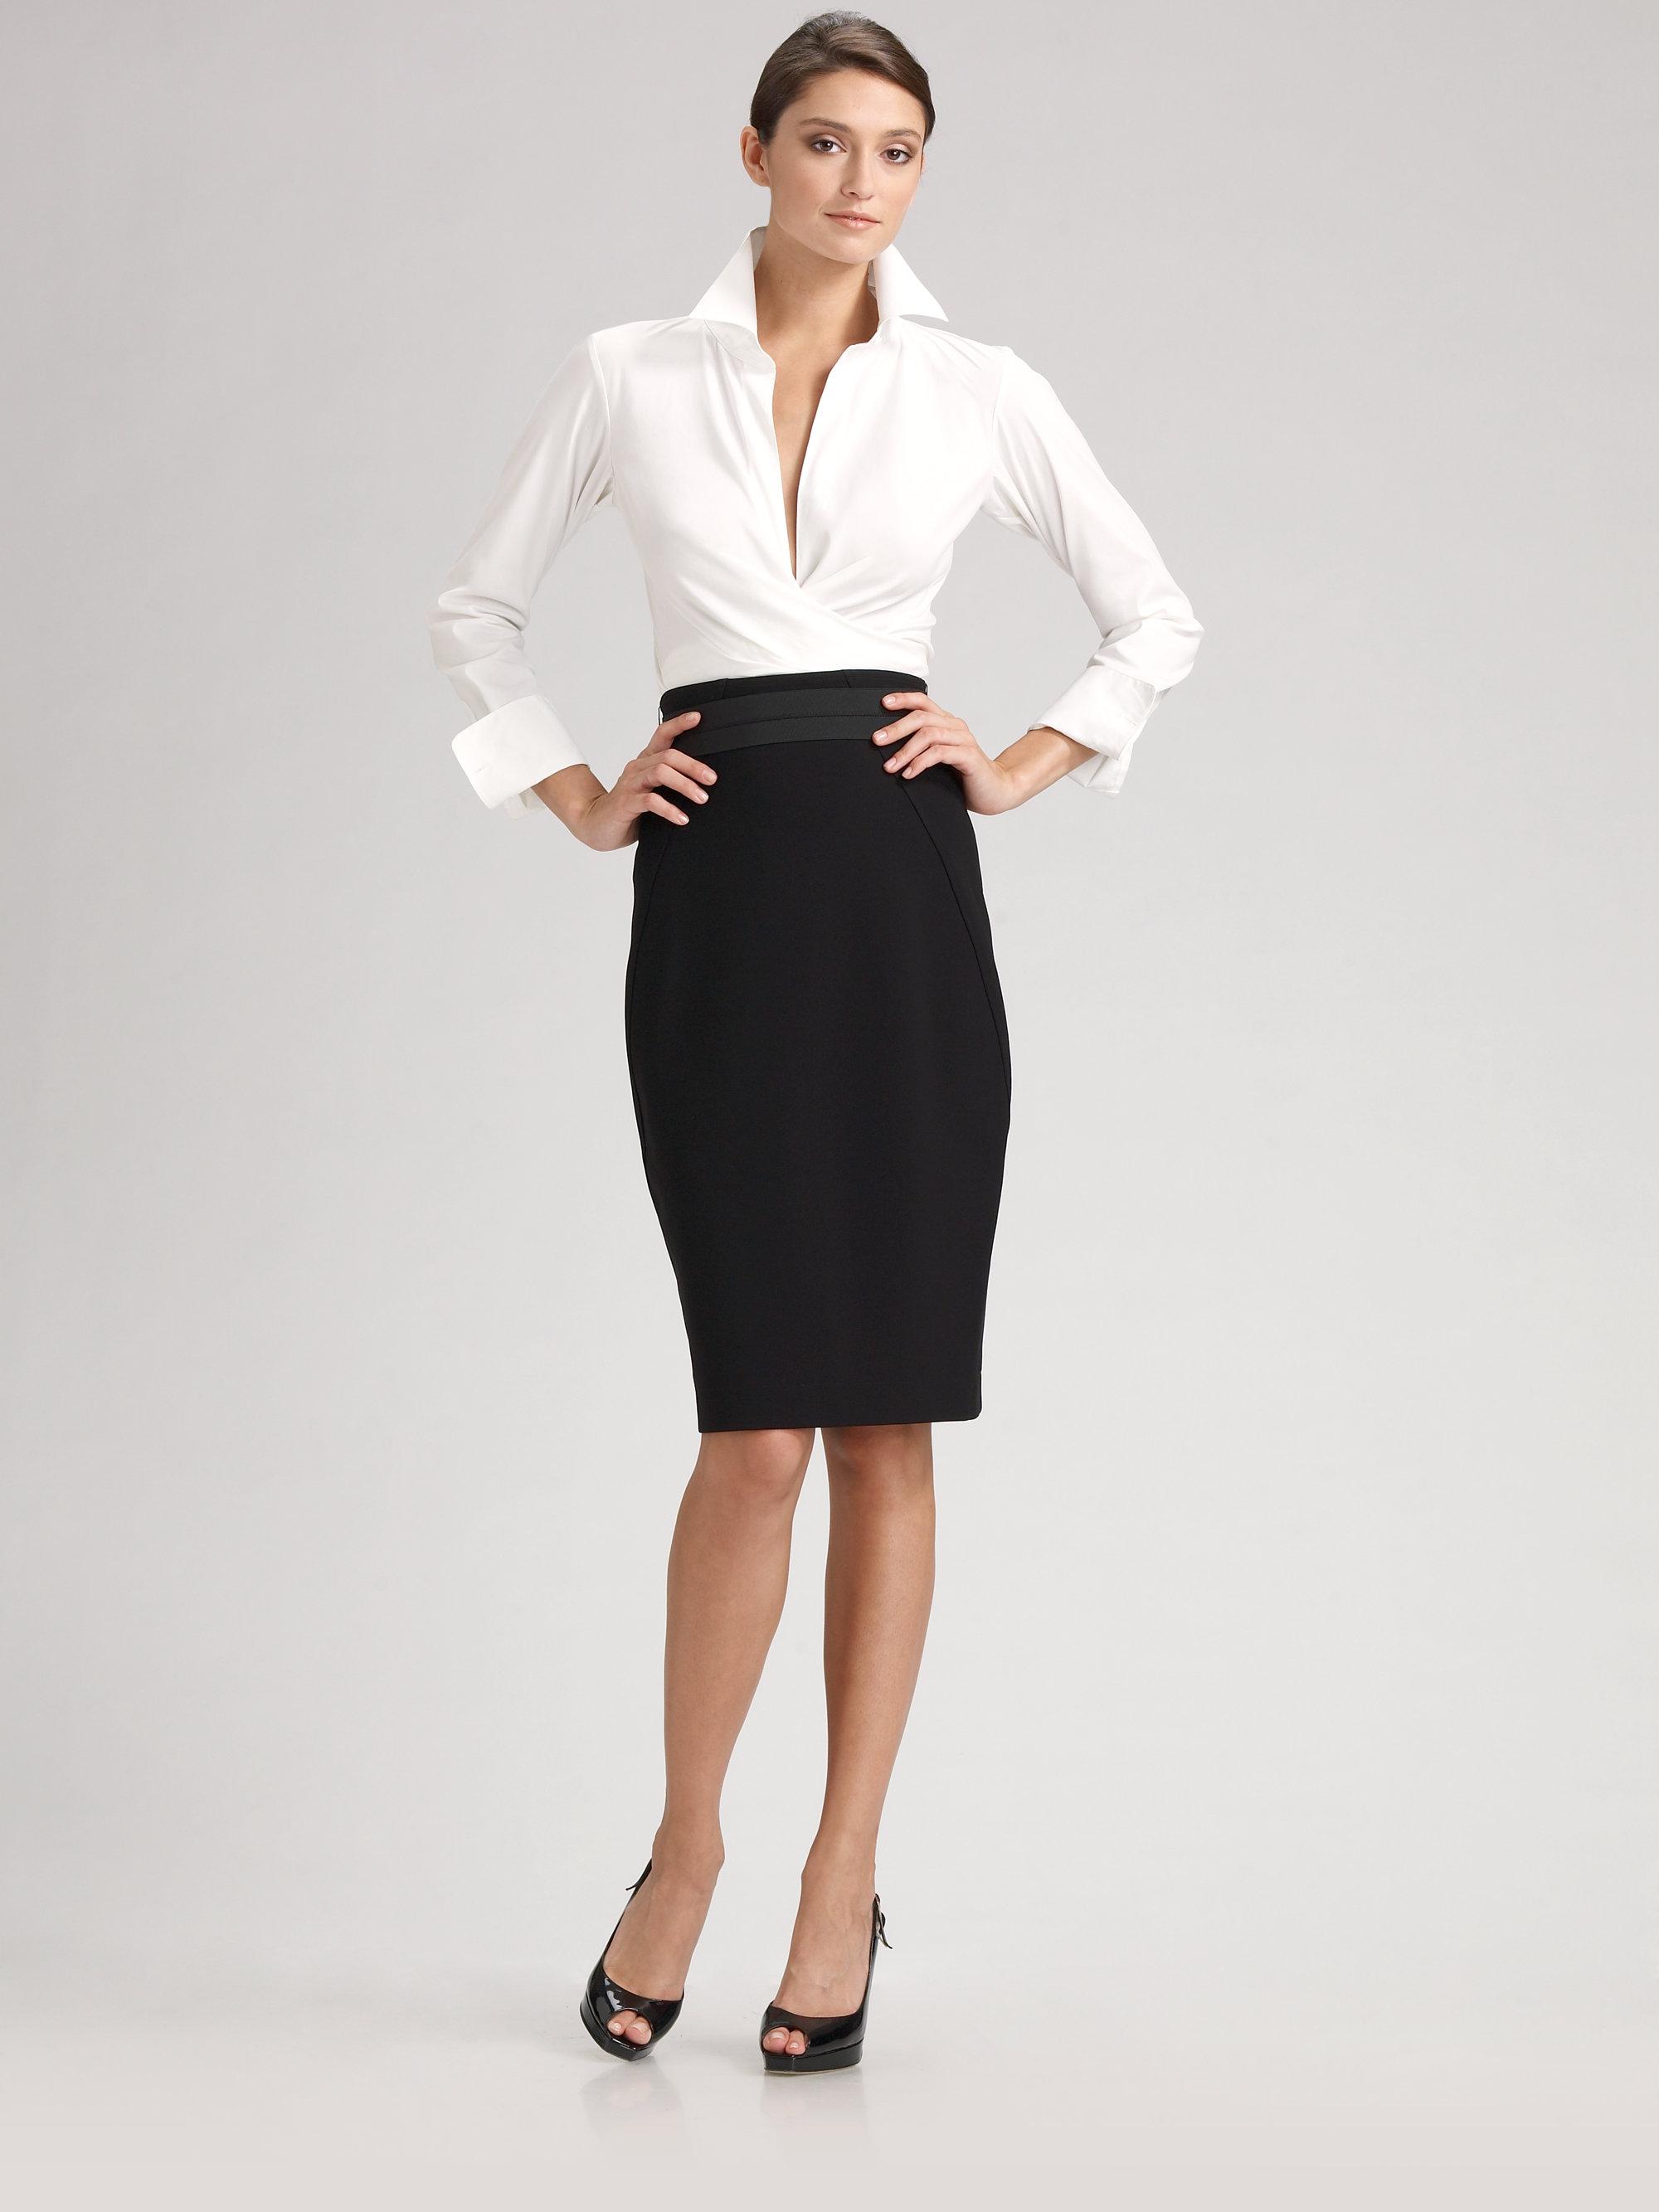 5d400904fb76a Lyst - Donna Karan Stretch Cotton Wrap Shirt in White